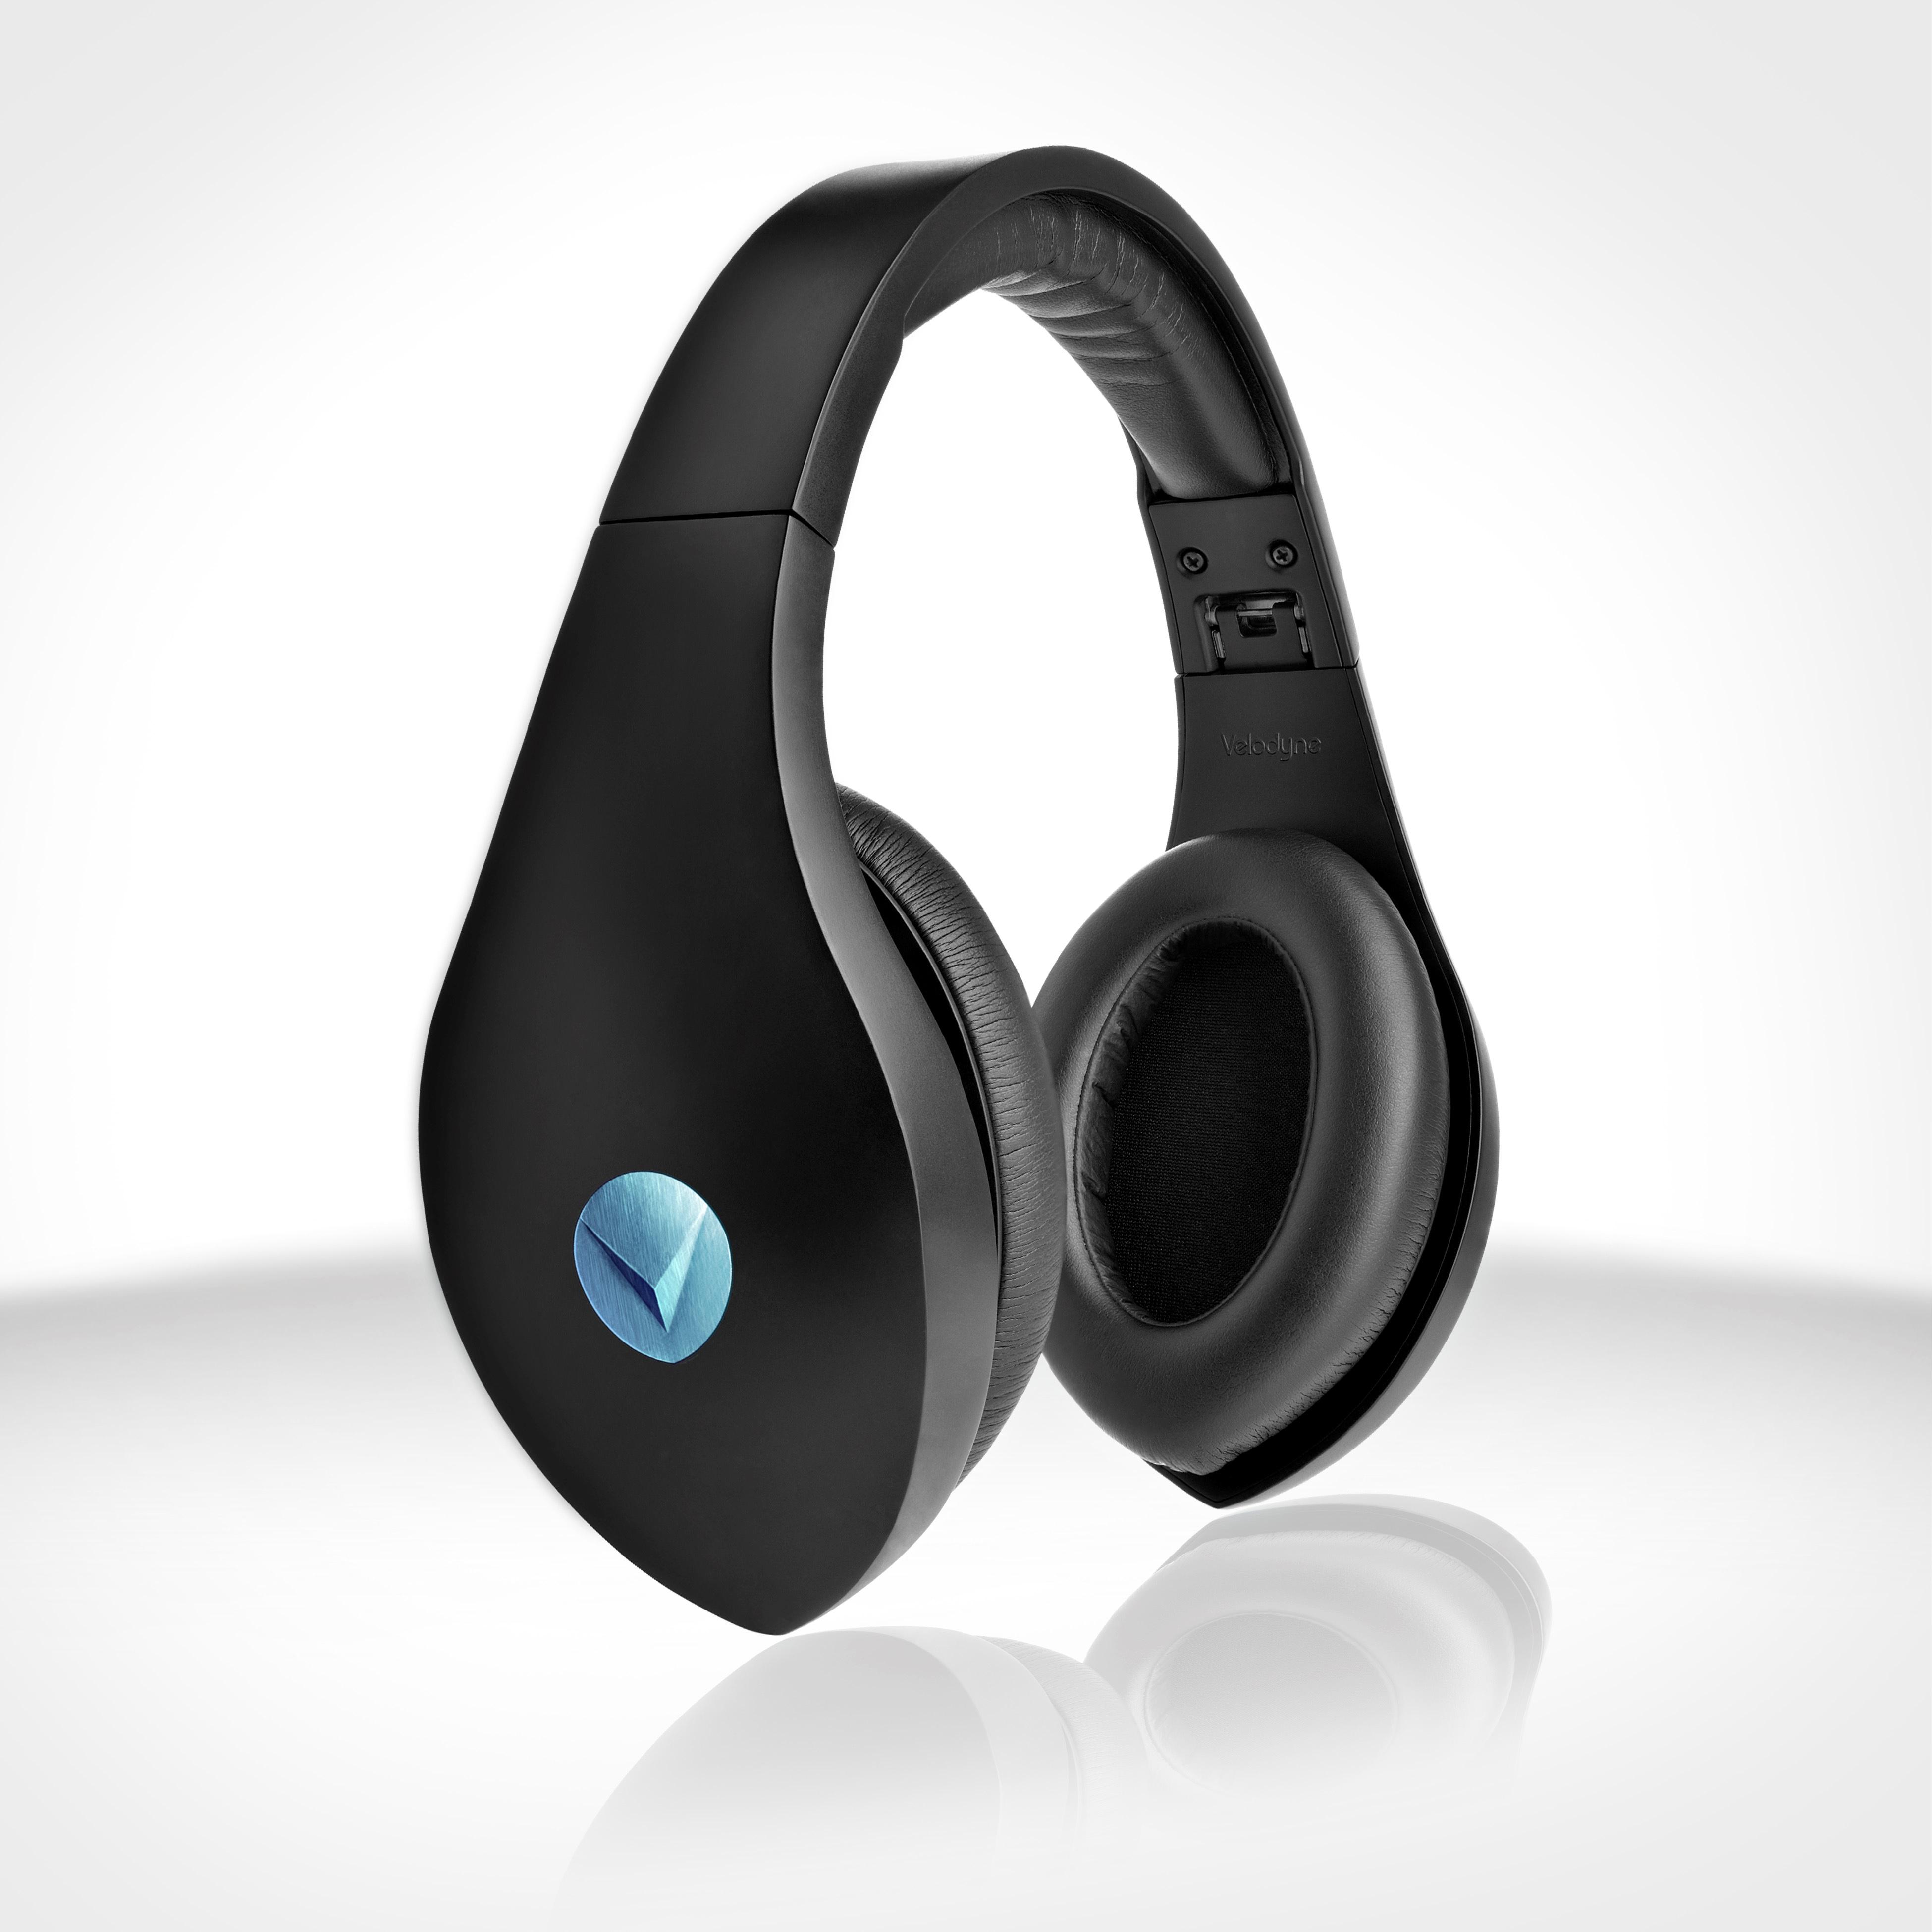 Headphones wireless vfree bluetooth - bluetooth headphones wireless true